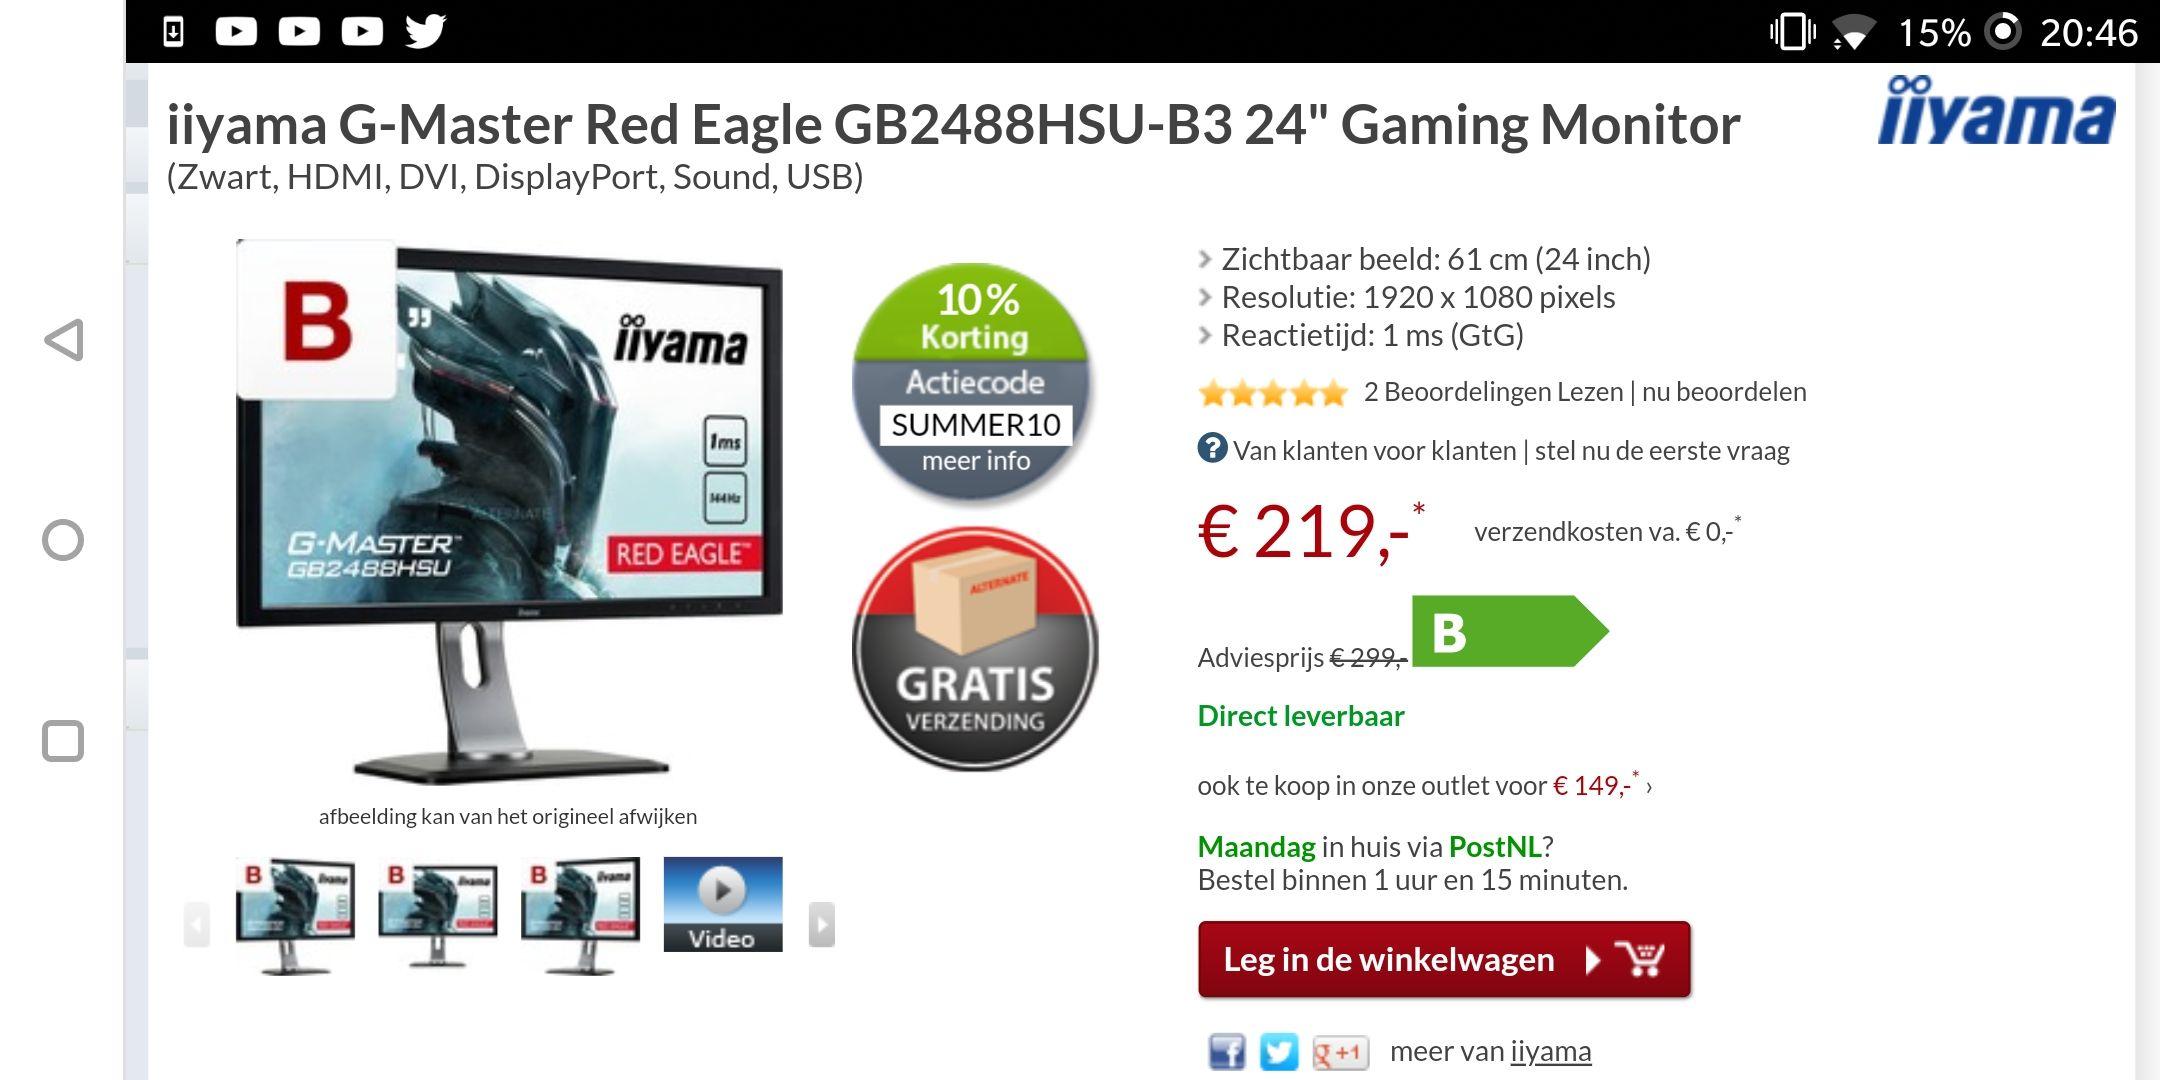 "Ijyama G-Master red eagle GB2488HSU-B3 24"""